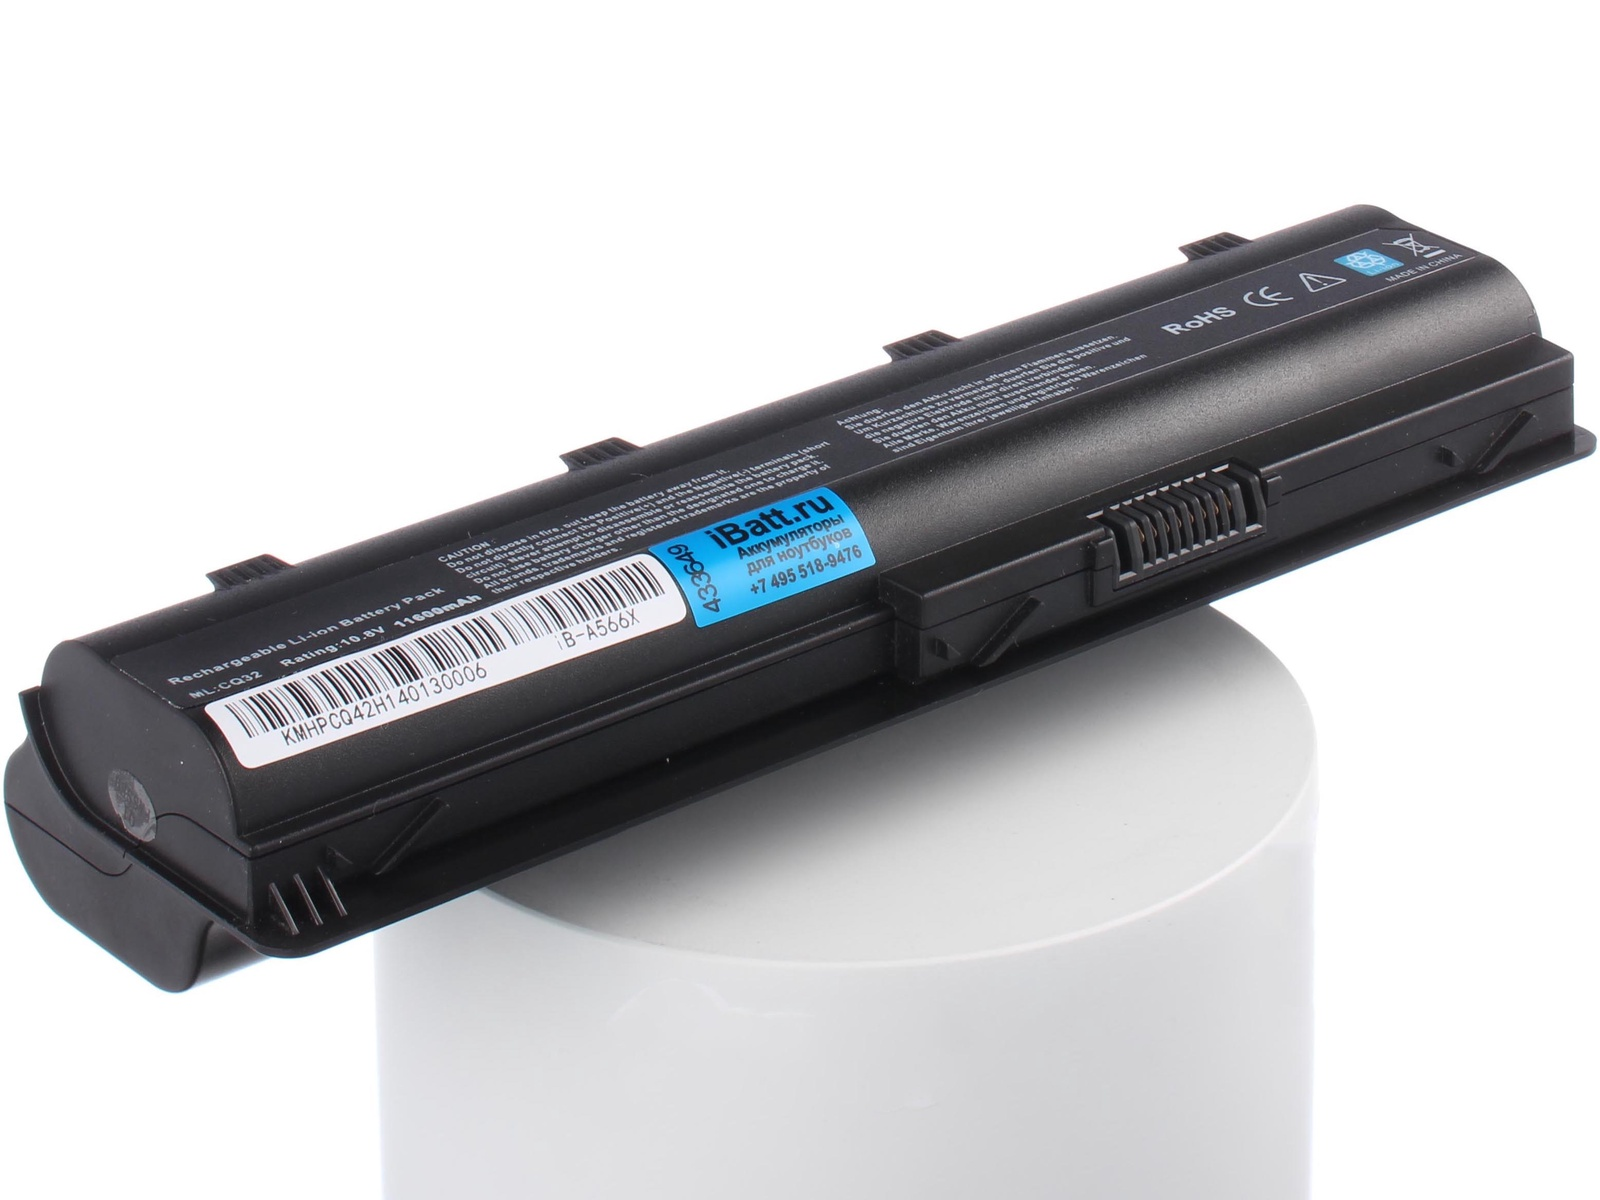 Аккумулятор для ноутбука iBatt для HP-Compaq Pavilion g6-2367er, Pavilion g7-1307er, 650 Notebook PC, Pavilion g6-1157er, Pavilion g6-1251er, Pavilion g7-2160sr, ENVY 17-2001er, G62-a70ER, Pavilion dv6-3301er, Pavilion DV6-6100 638856 001 da0r22mb6d1 d0 fit for hp pavilion g4 g6 g7 notebook motherboard tested working